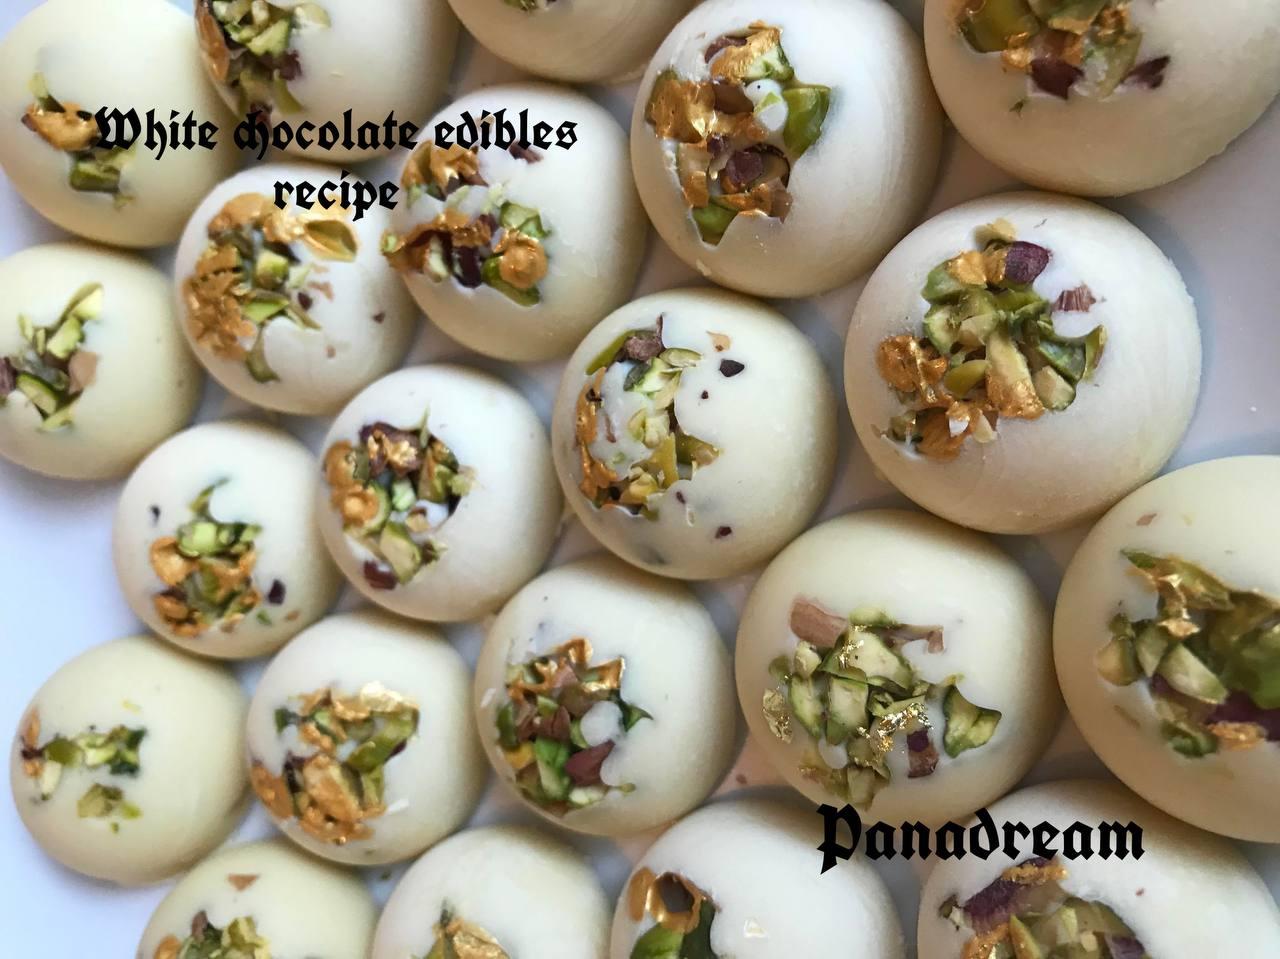 White chocolate edibles recipe